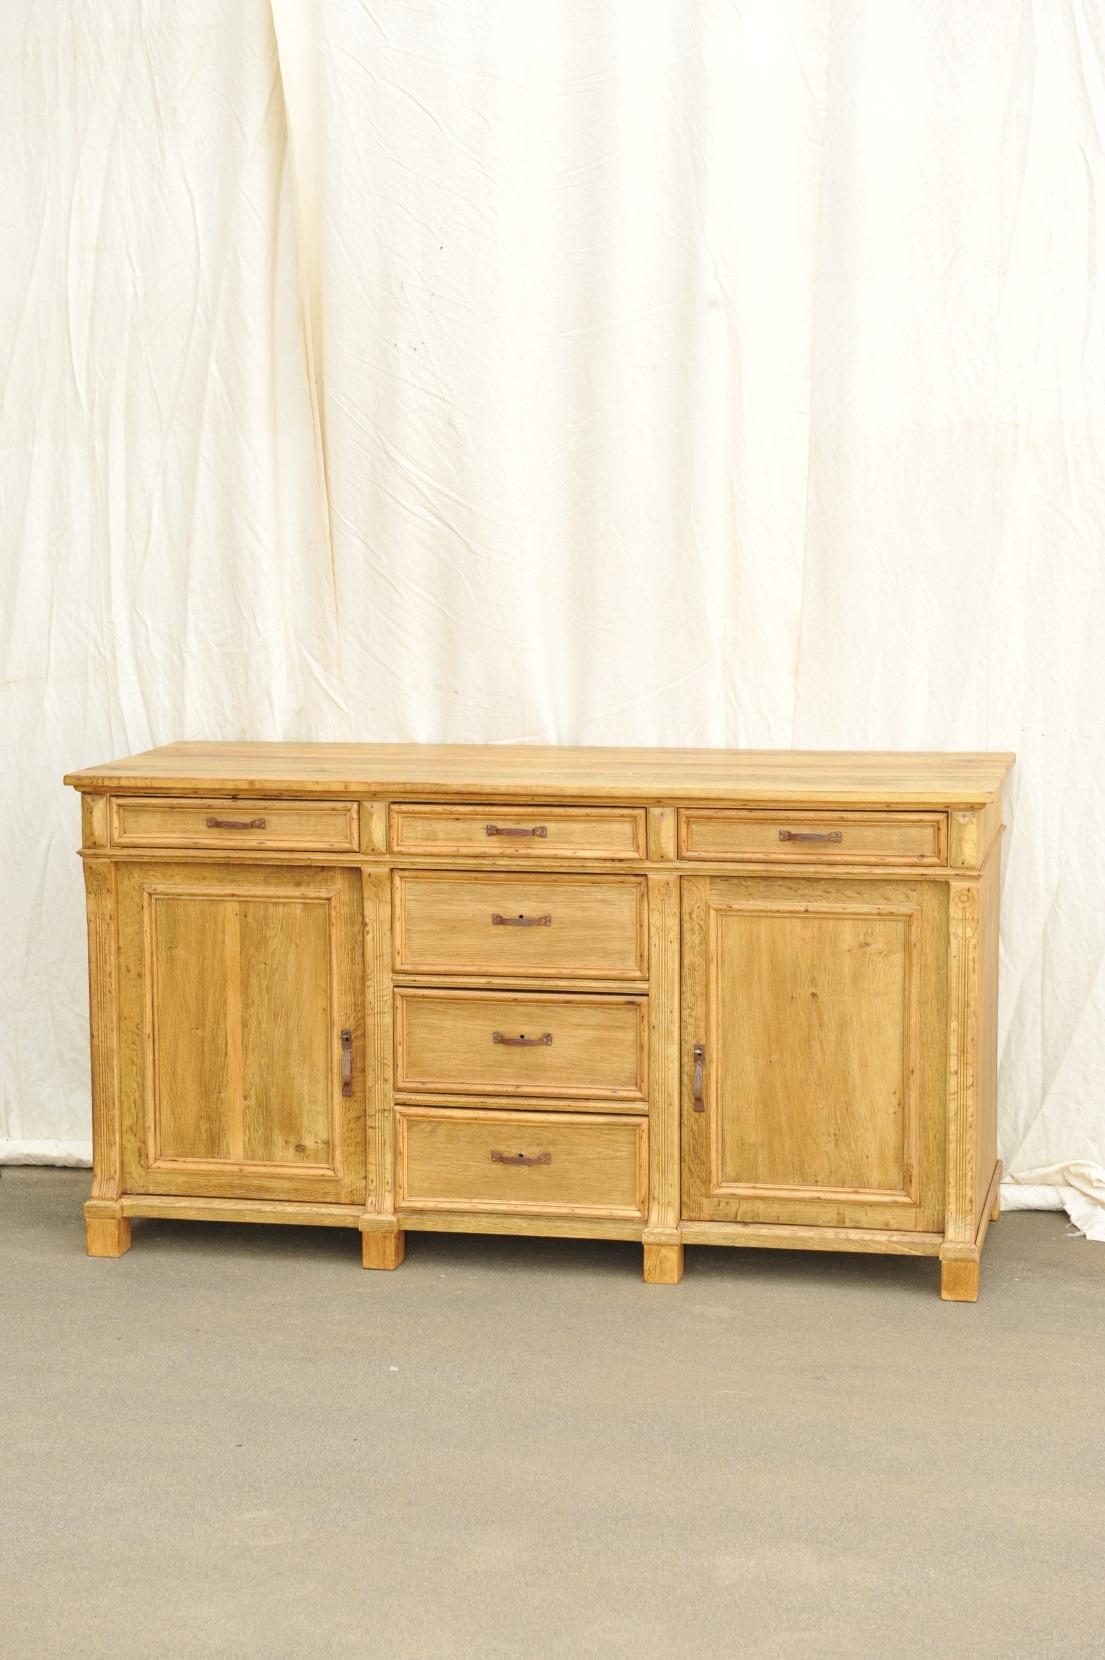 ladentresen jugendtsil eiche anrichte antik im hof. Black Bedroom Furniture Sets. Home Design Ideas